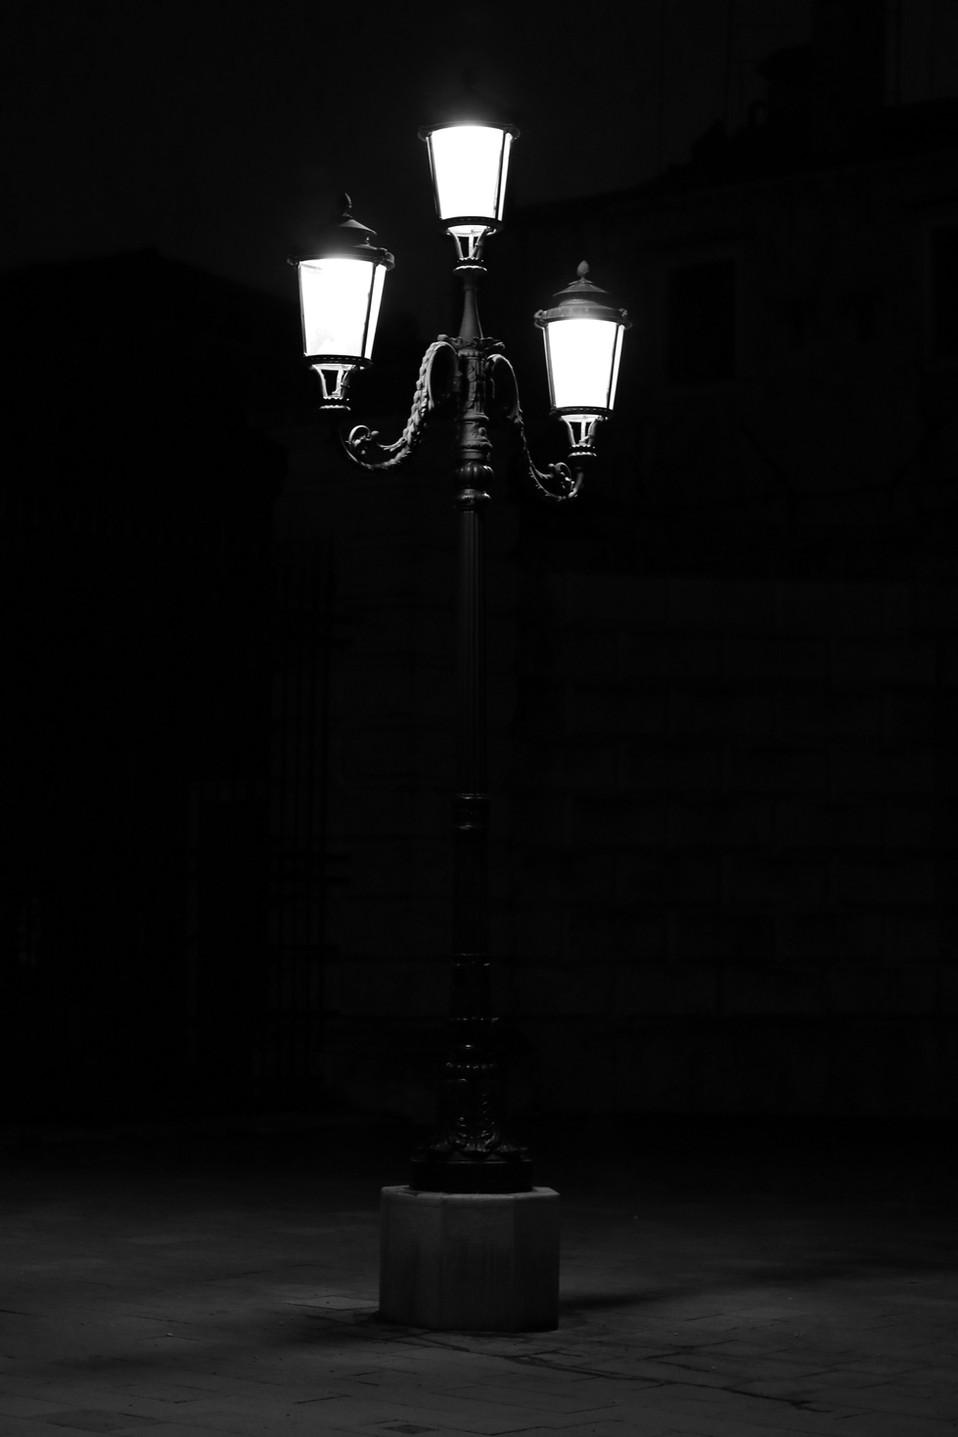 lampione.jpg